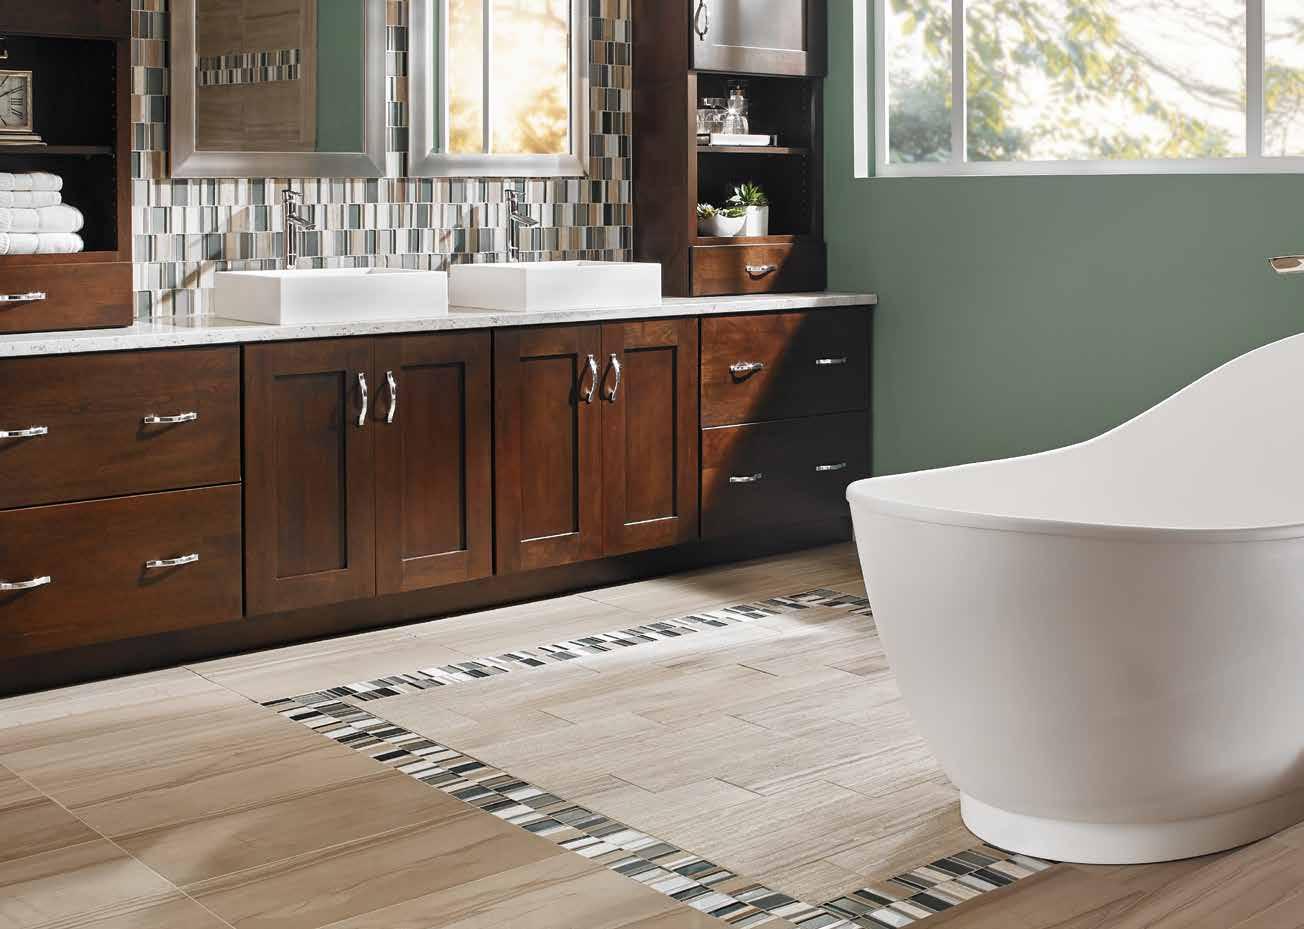 MSI Mosaic tiles in modern bathroom design with soak up bath tub